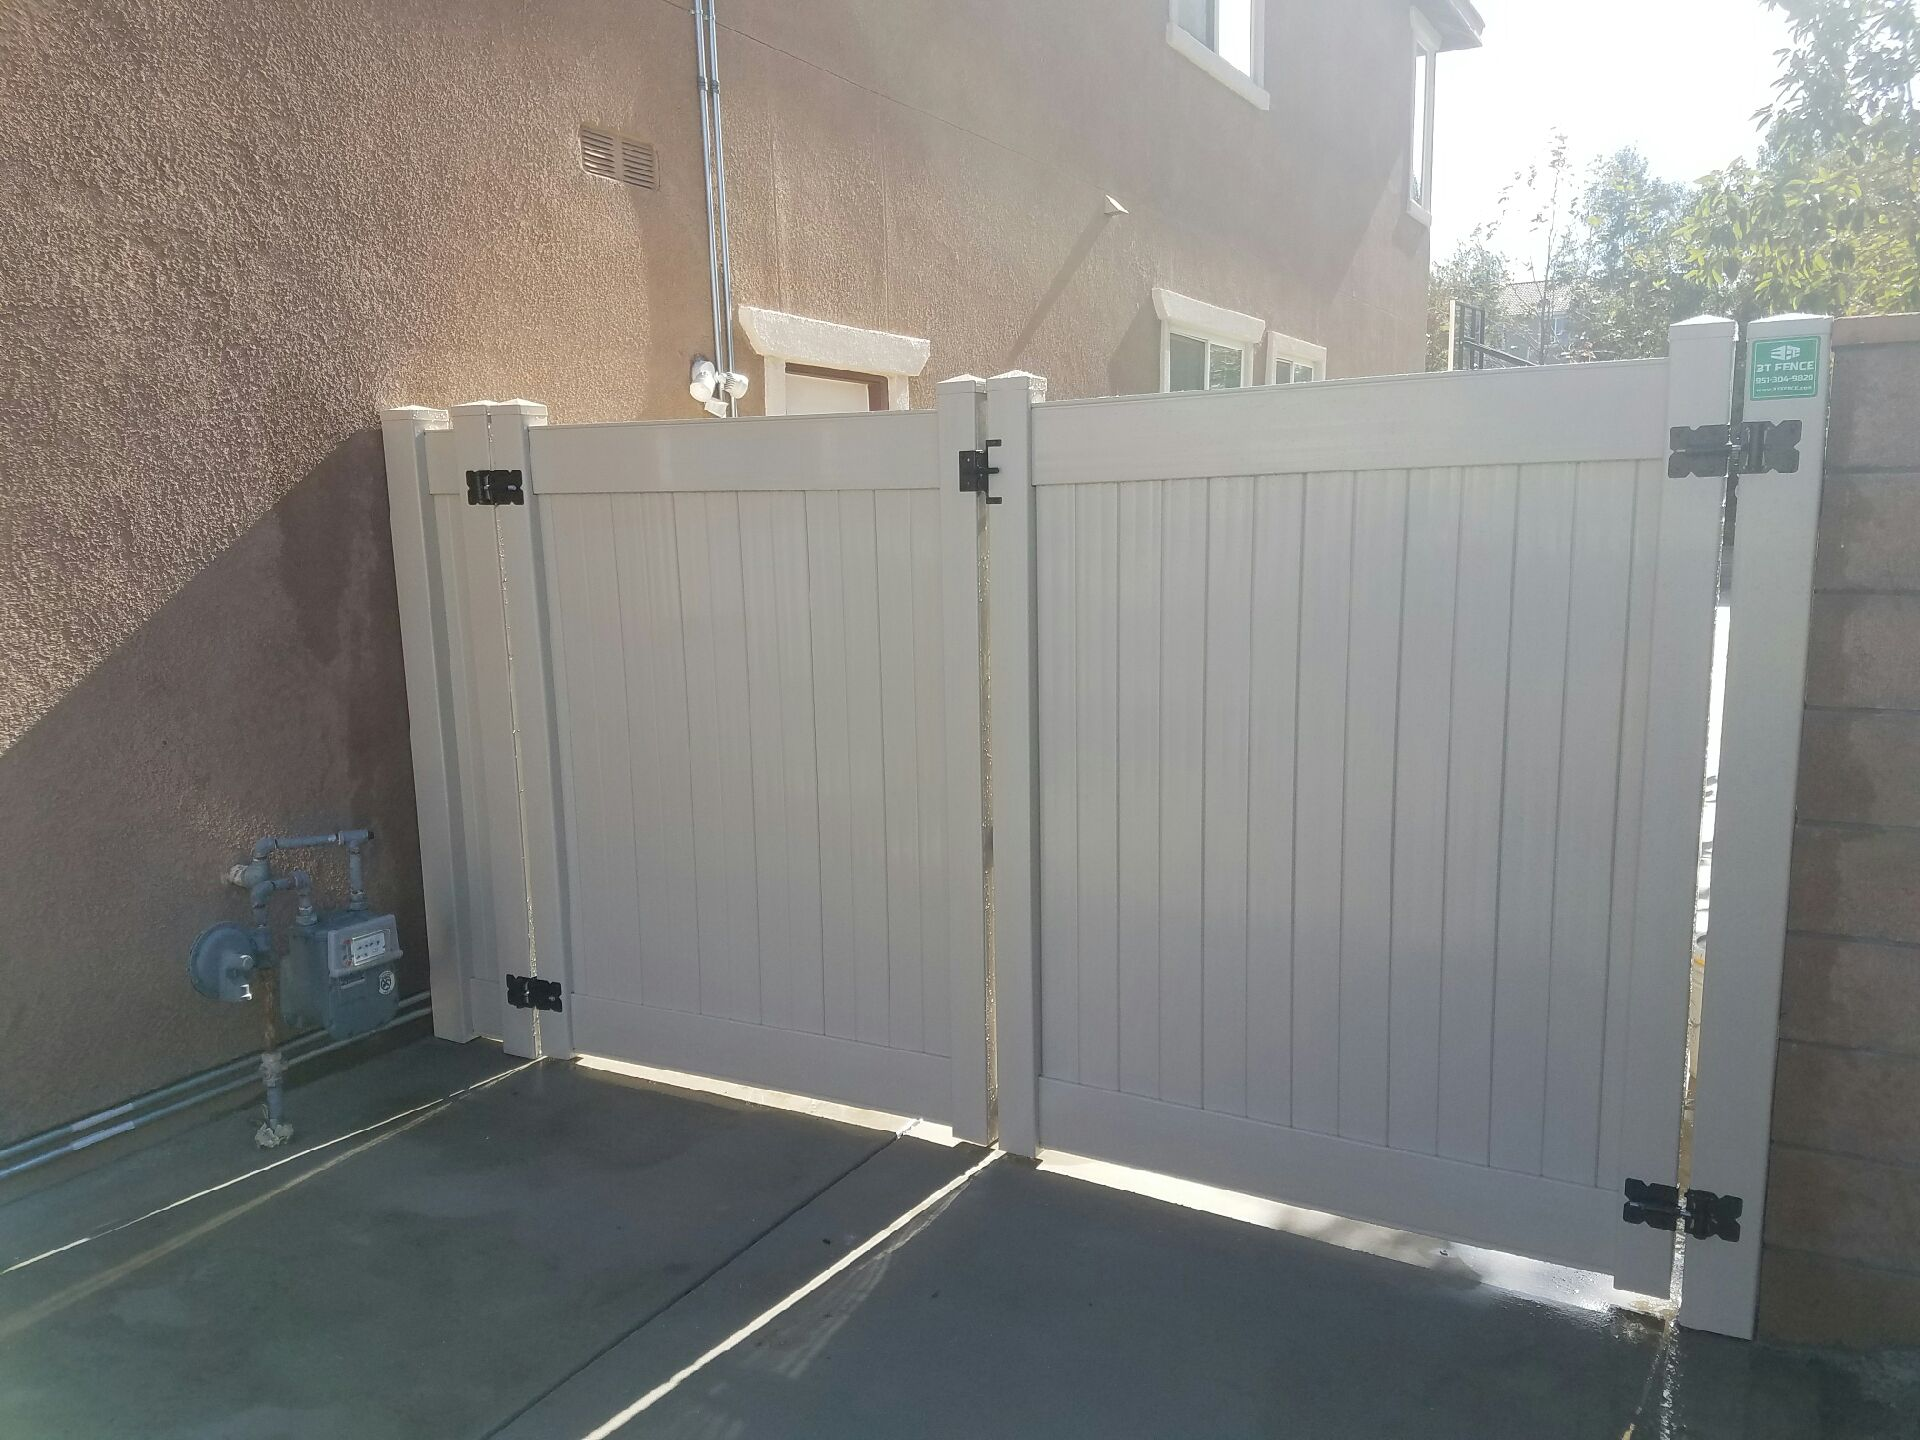 3T Fence image 36